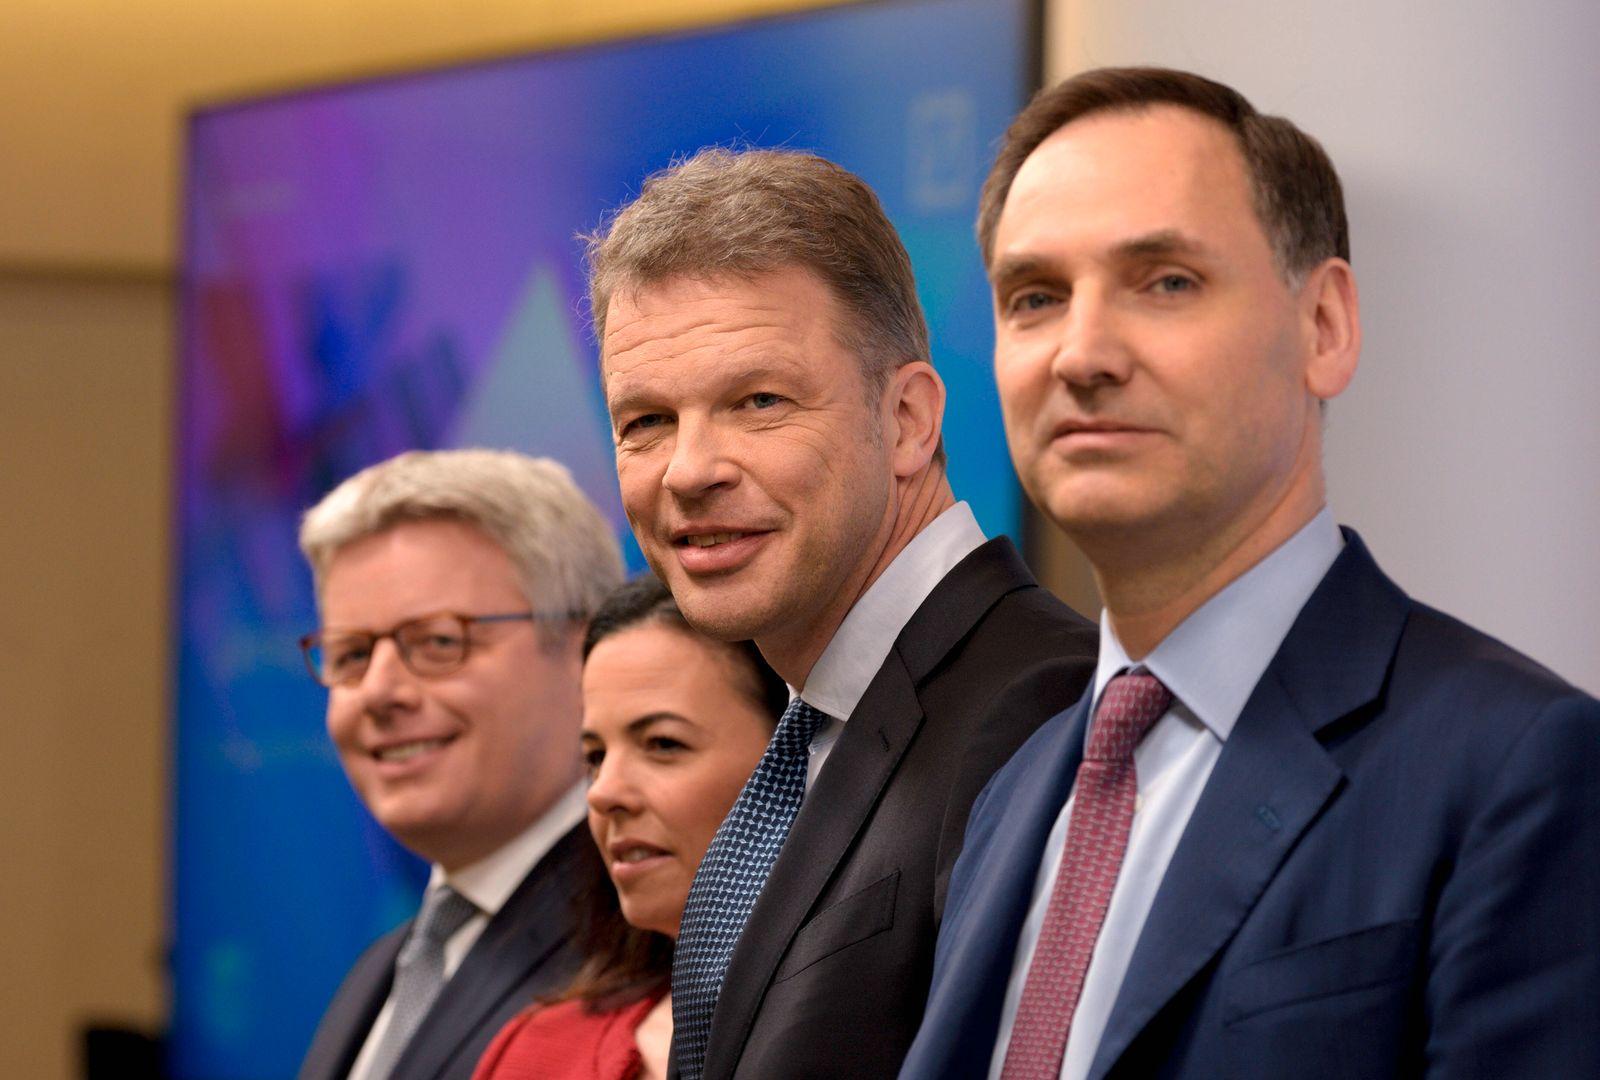 Bilanzpressekonferenz der Deutsche Bank AG am 30.01.2020 : Fabrizio CAMPELLI , Christiana RILEY , Christian SEWING , Jam